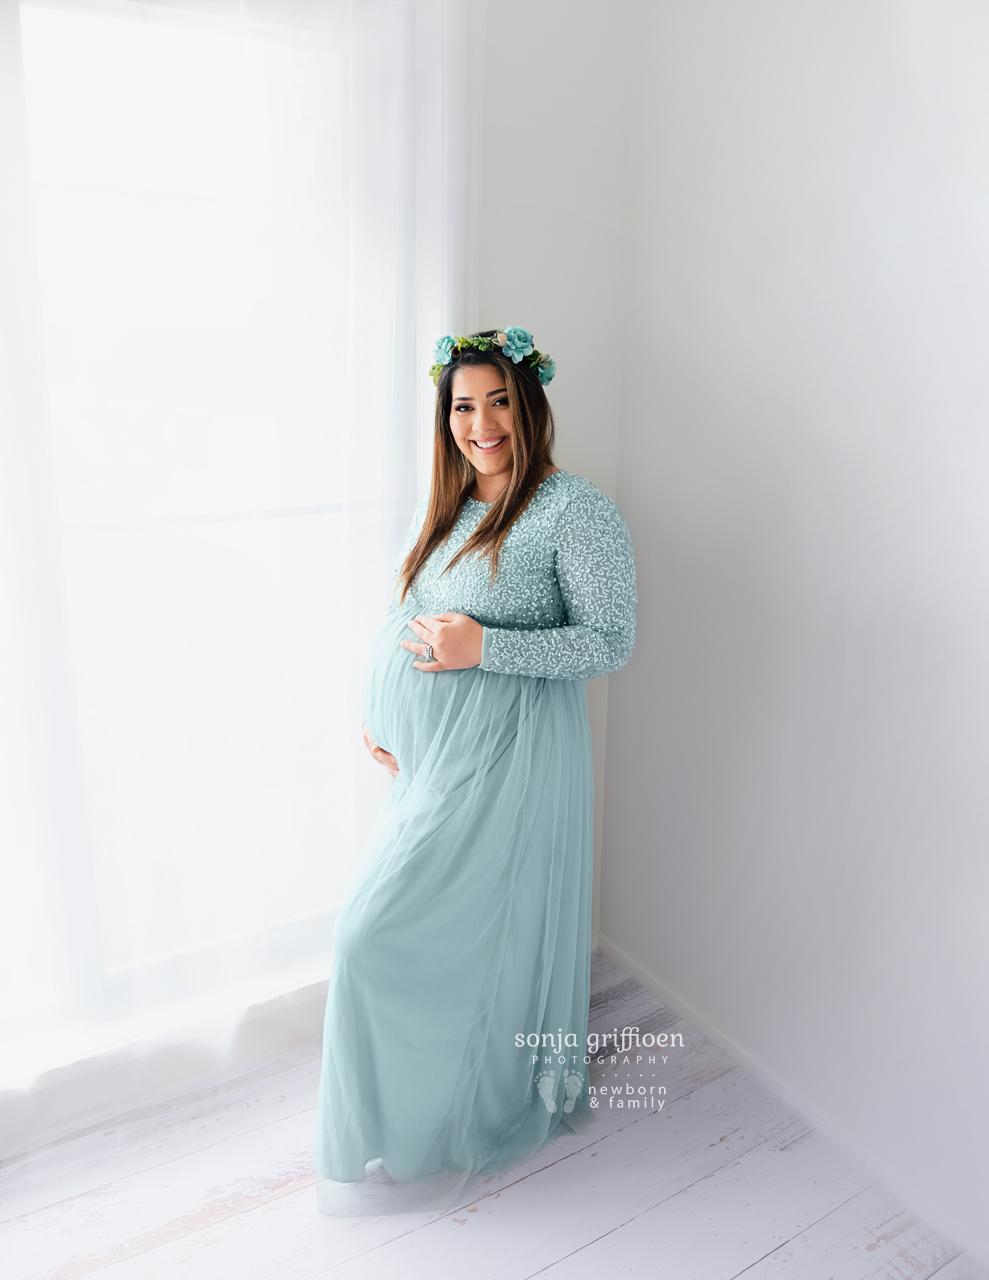 Noor-Maternity-Brisbane-Newborn-Photographer-Sonja-Griffioen-04.jpg